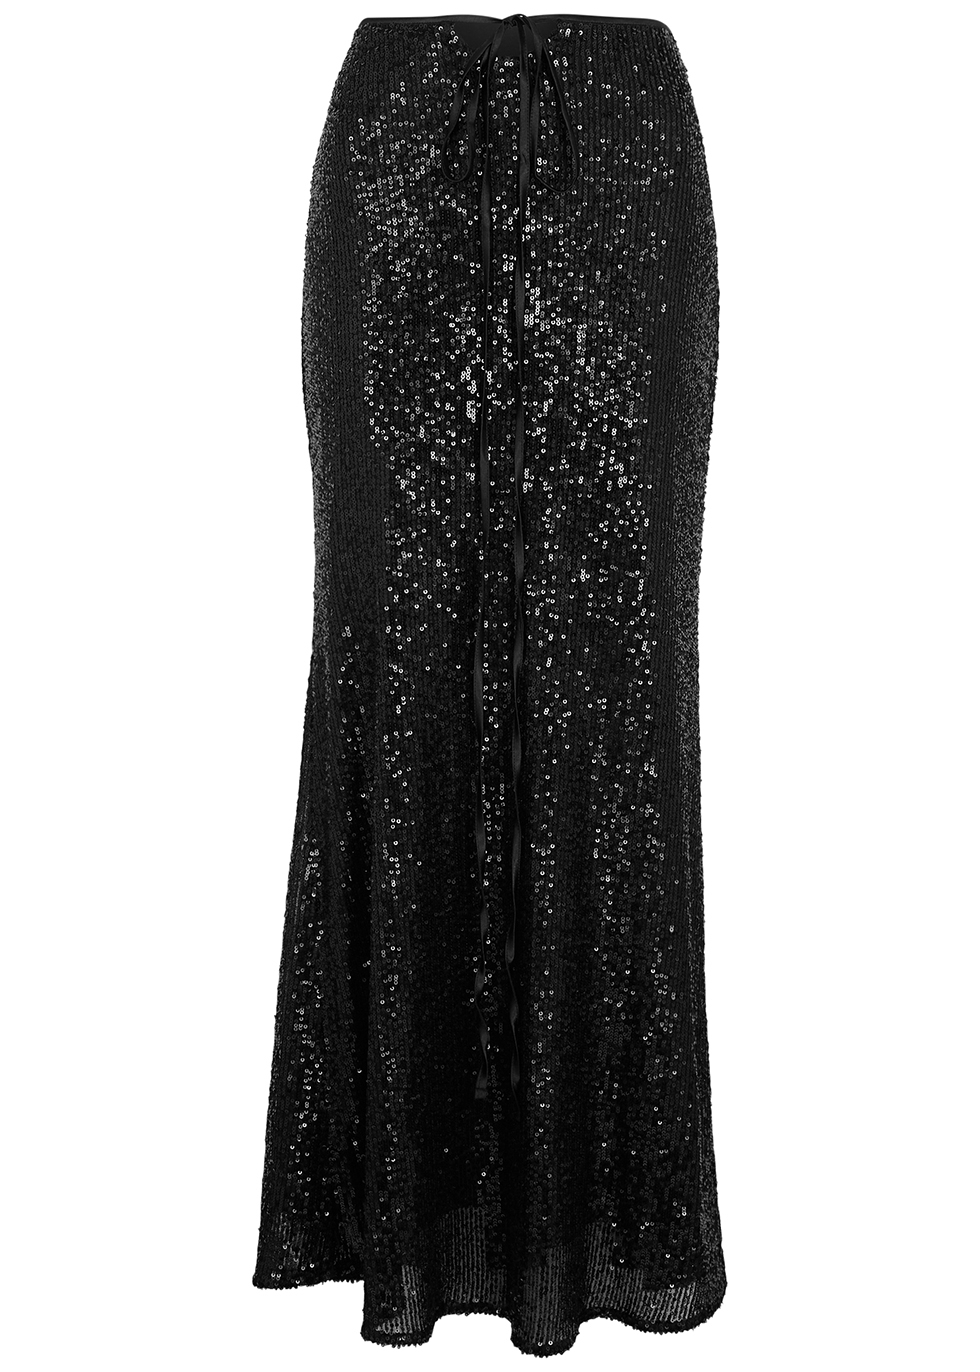 Boyd black sequin maxi skirt